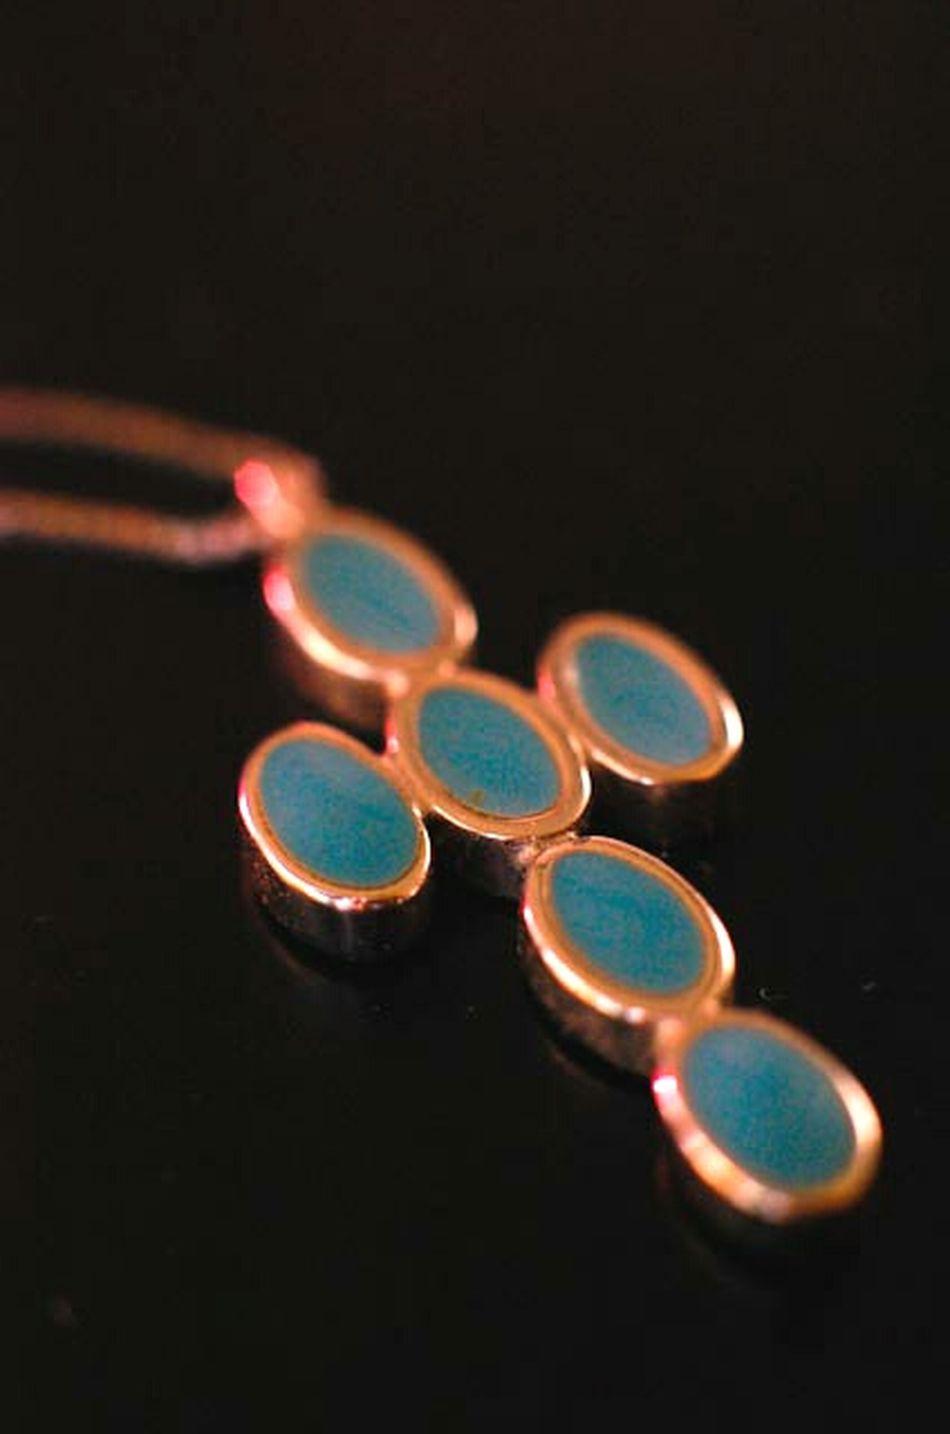 Macro Photography Jewelry Italianturquoise Turqoise Crosspendant Cross Whitegold Necklace Nikond40